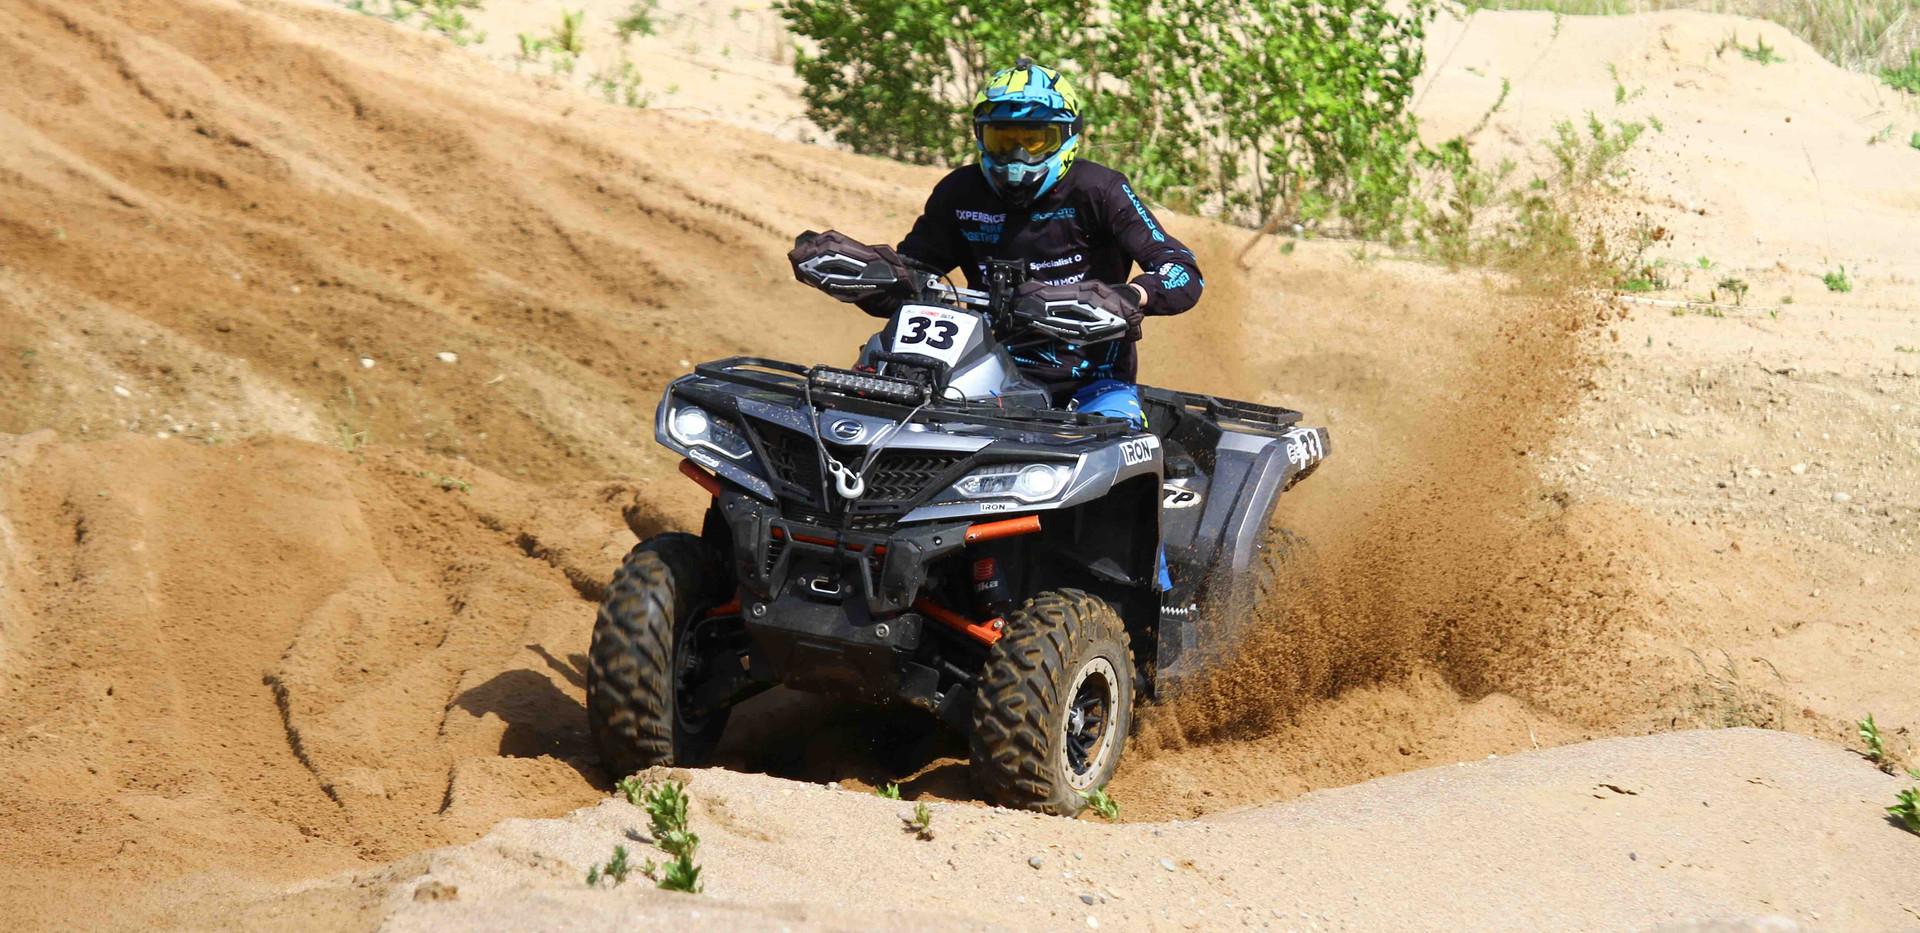 cfmoto racingteam sand box1.jpeg